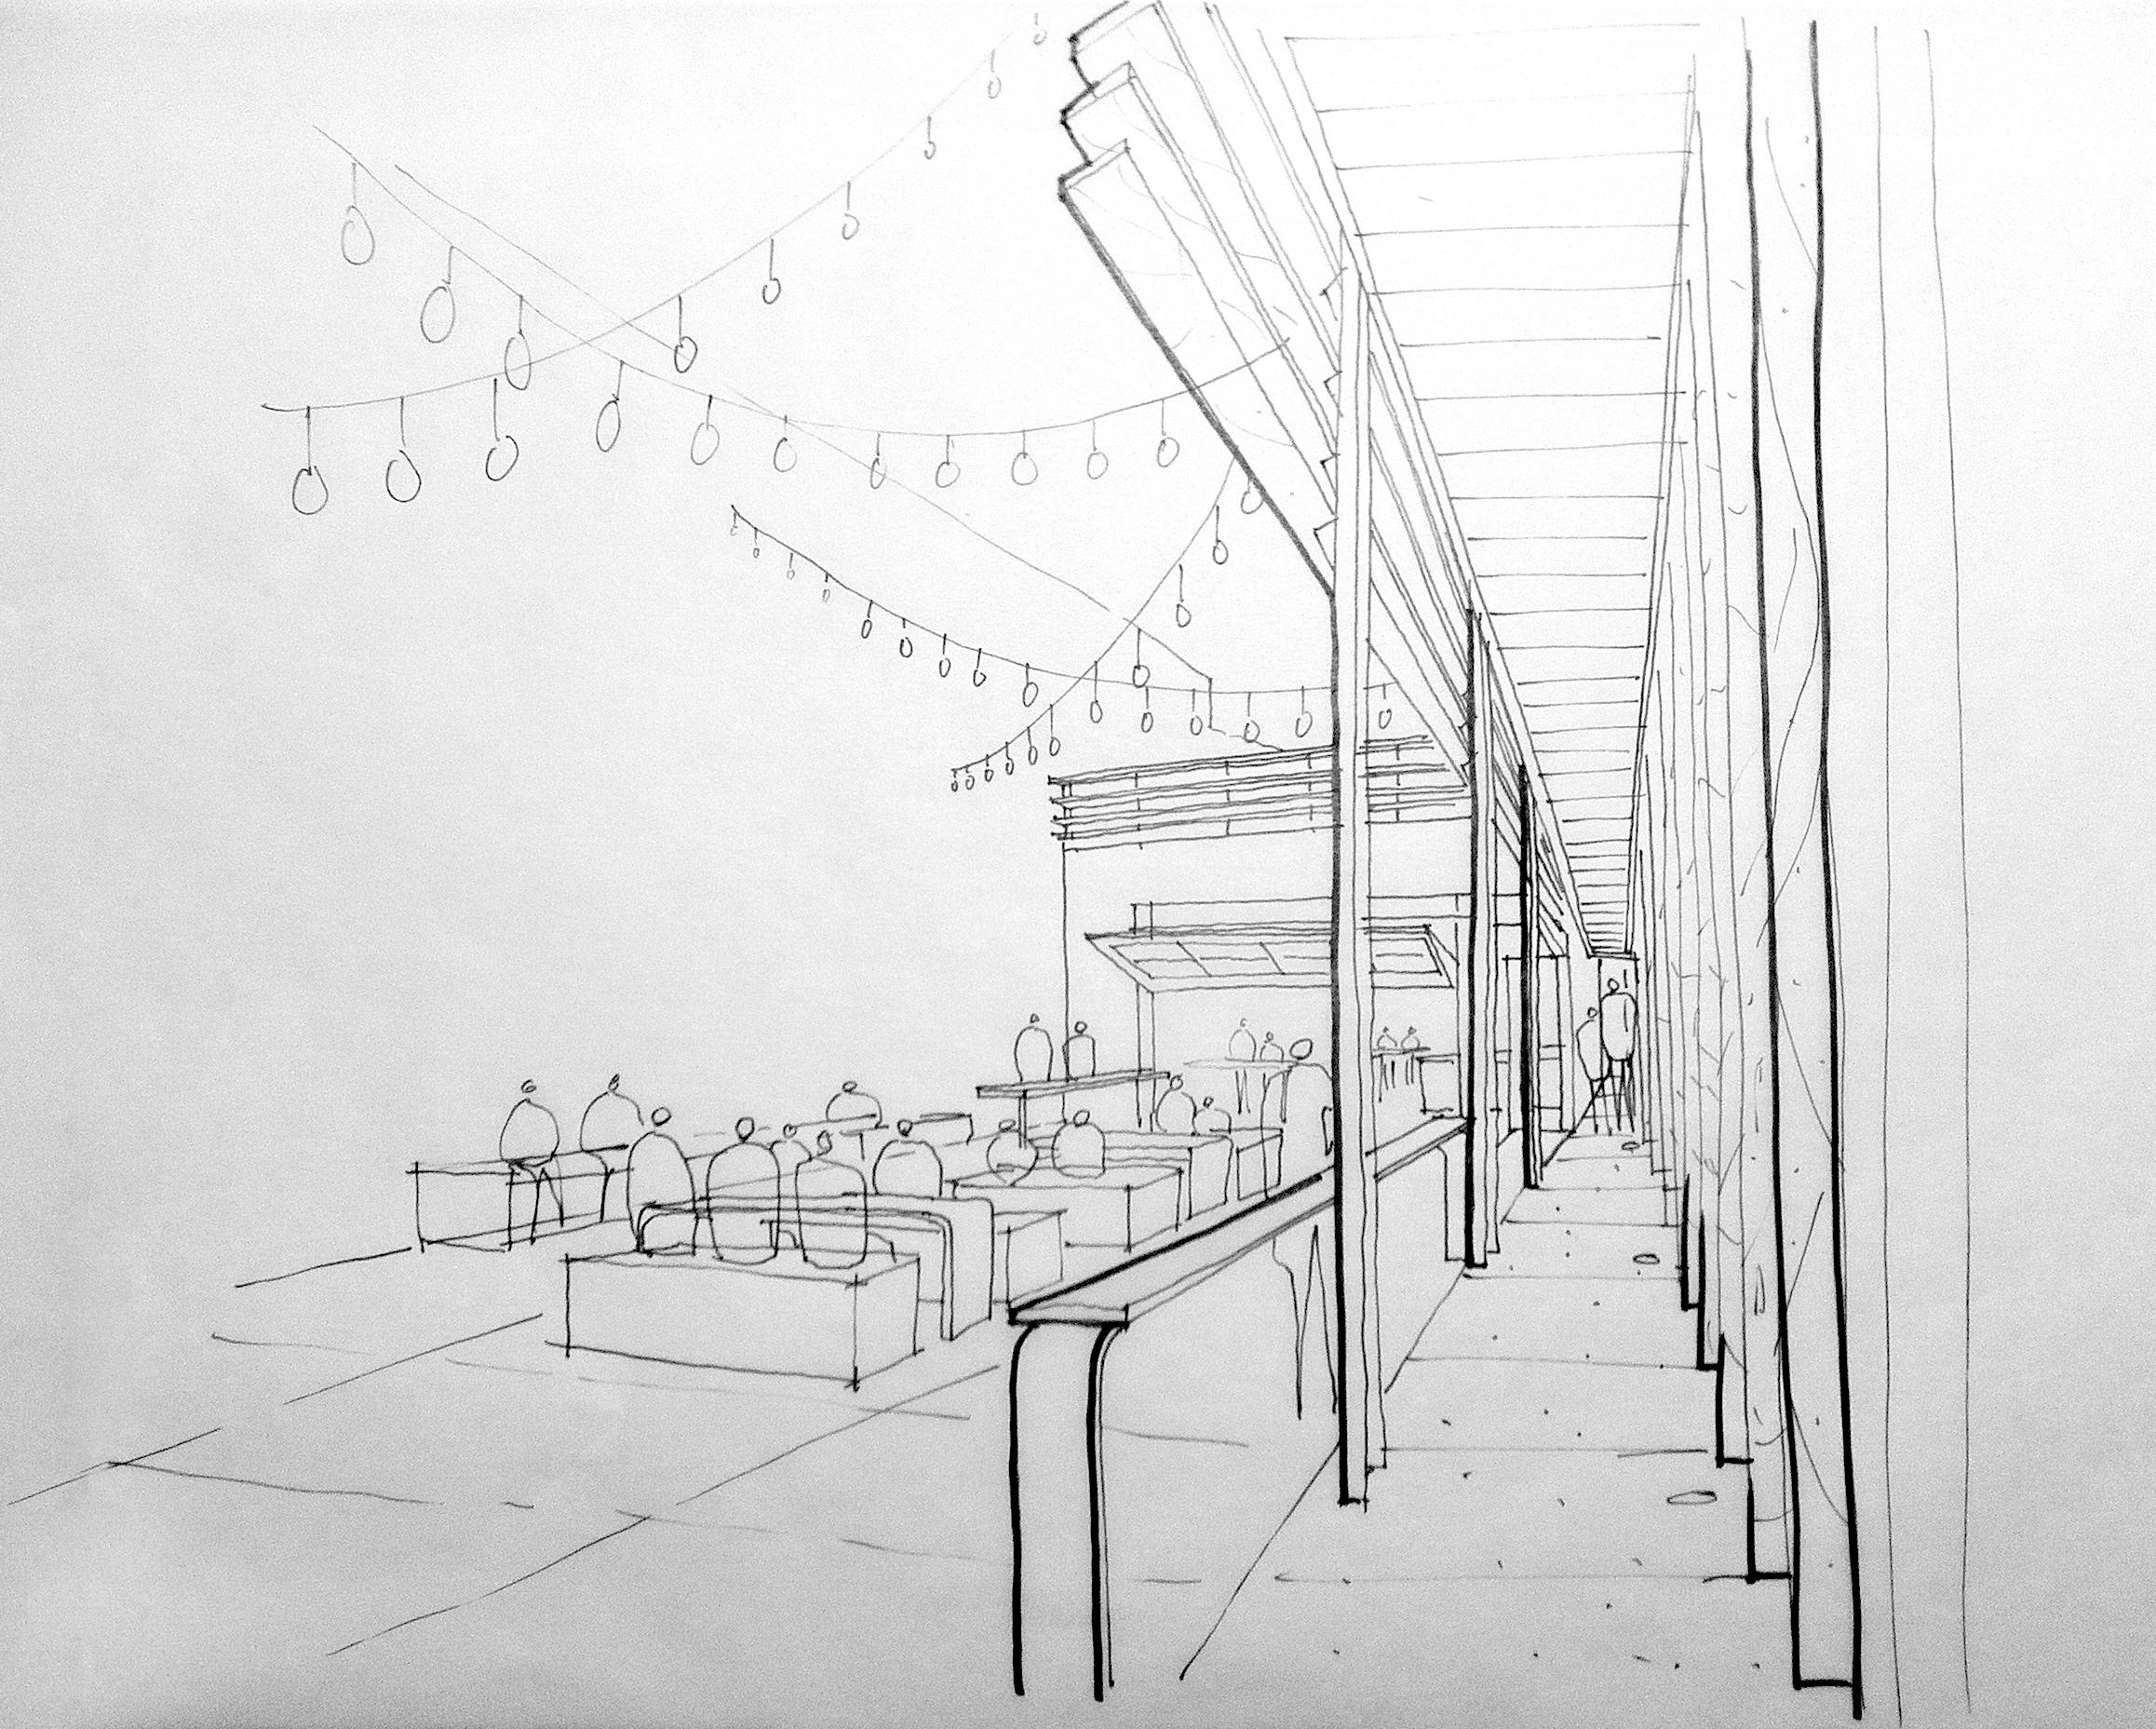 studio-saint-bars-and-restaurants-maketto-washington-dc-sketch-4